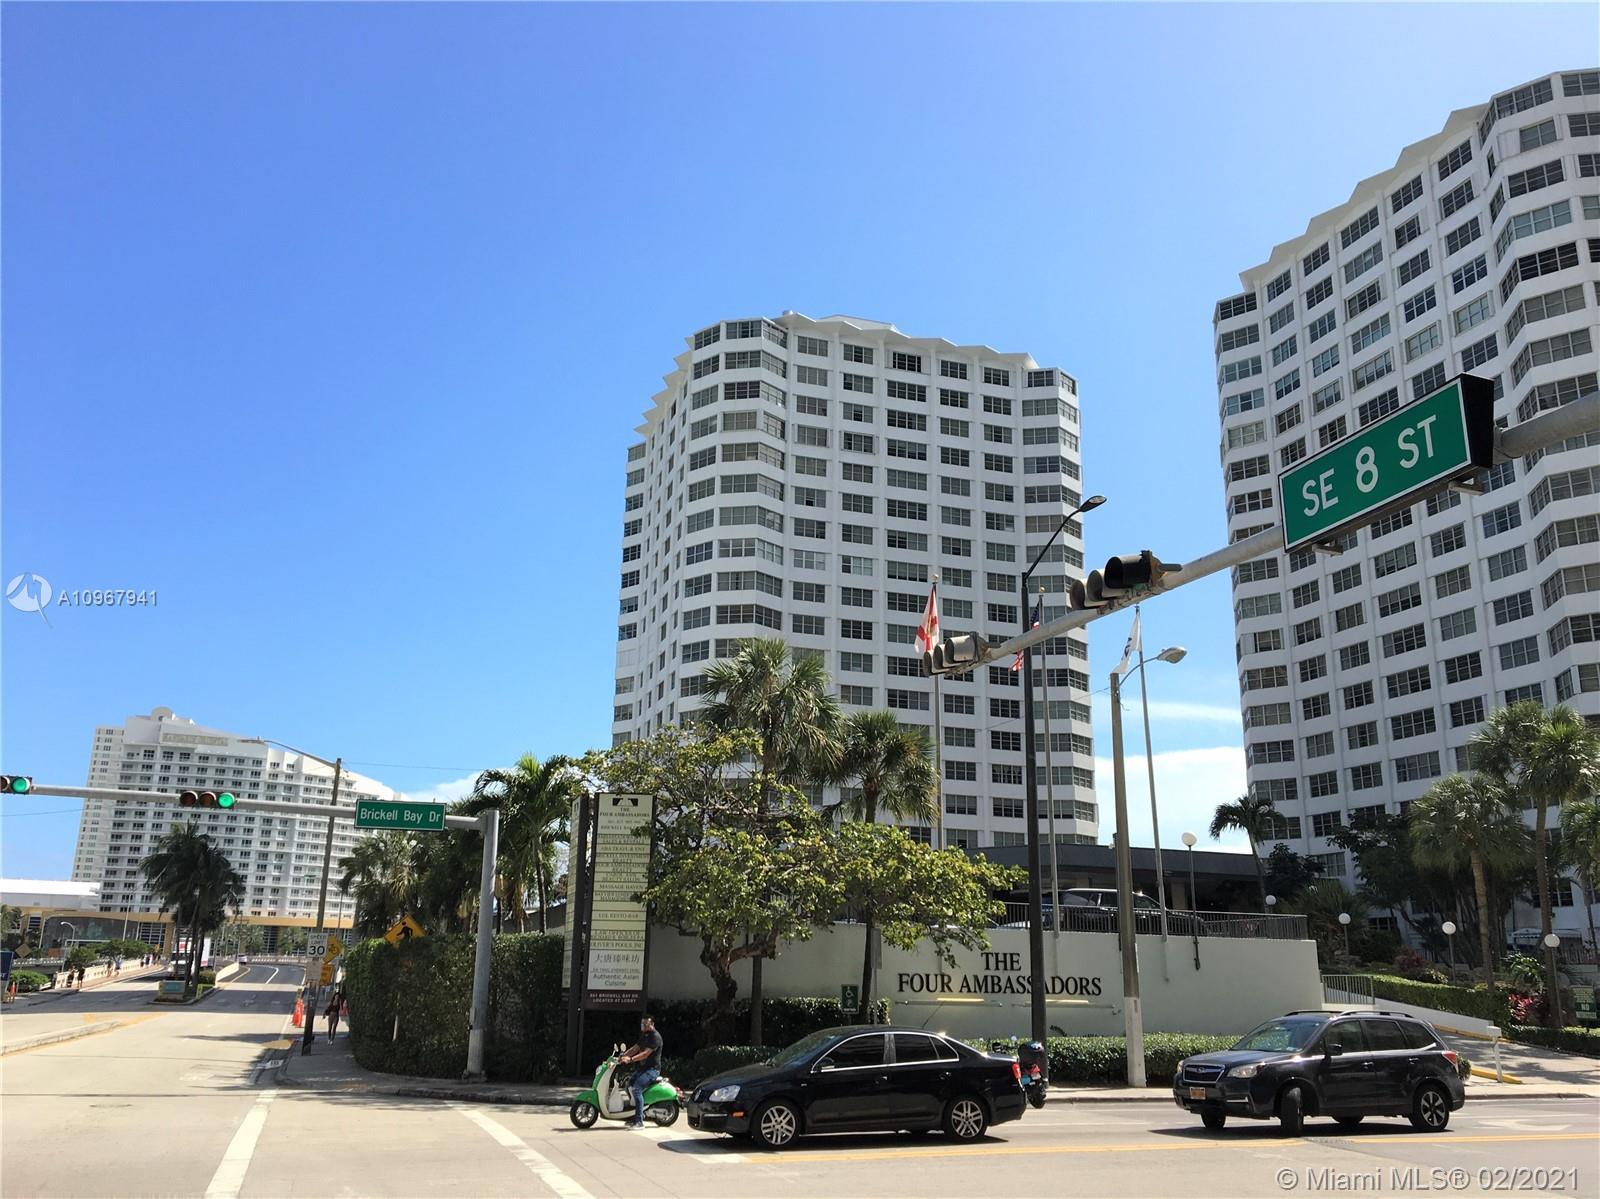 Courts Brickell Key #4CL41B - 801 Brickell Bay Dr #4CL41B, Miami, FL 33131